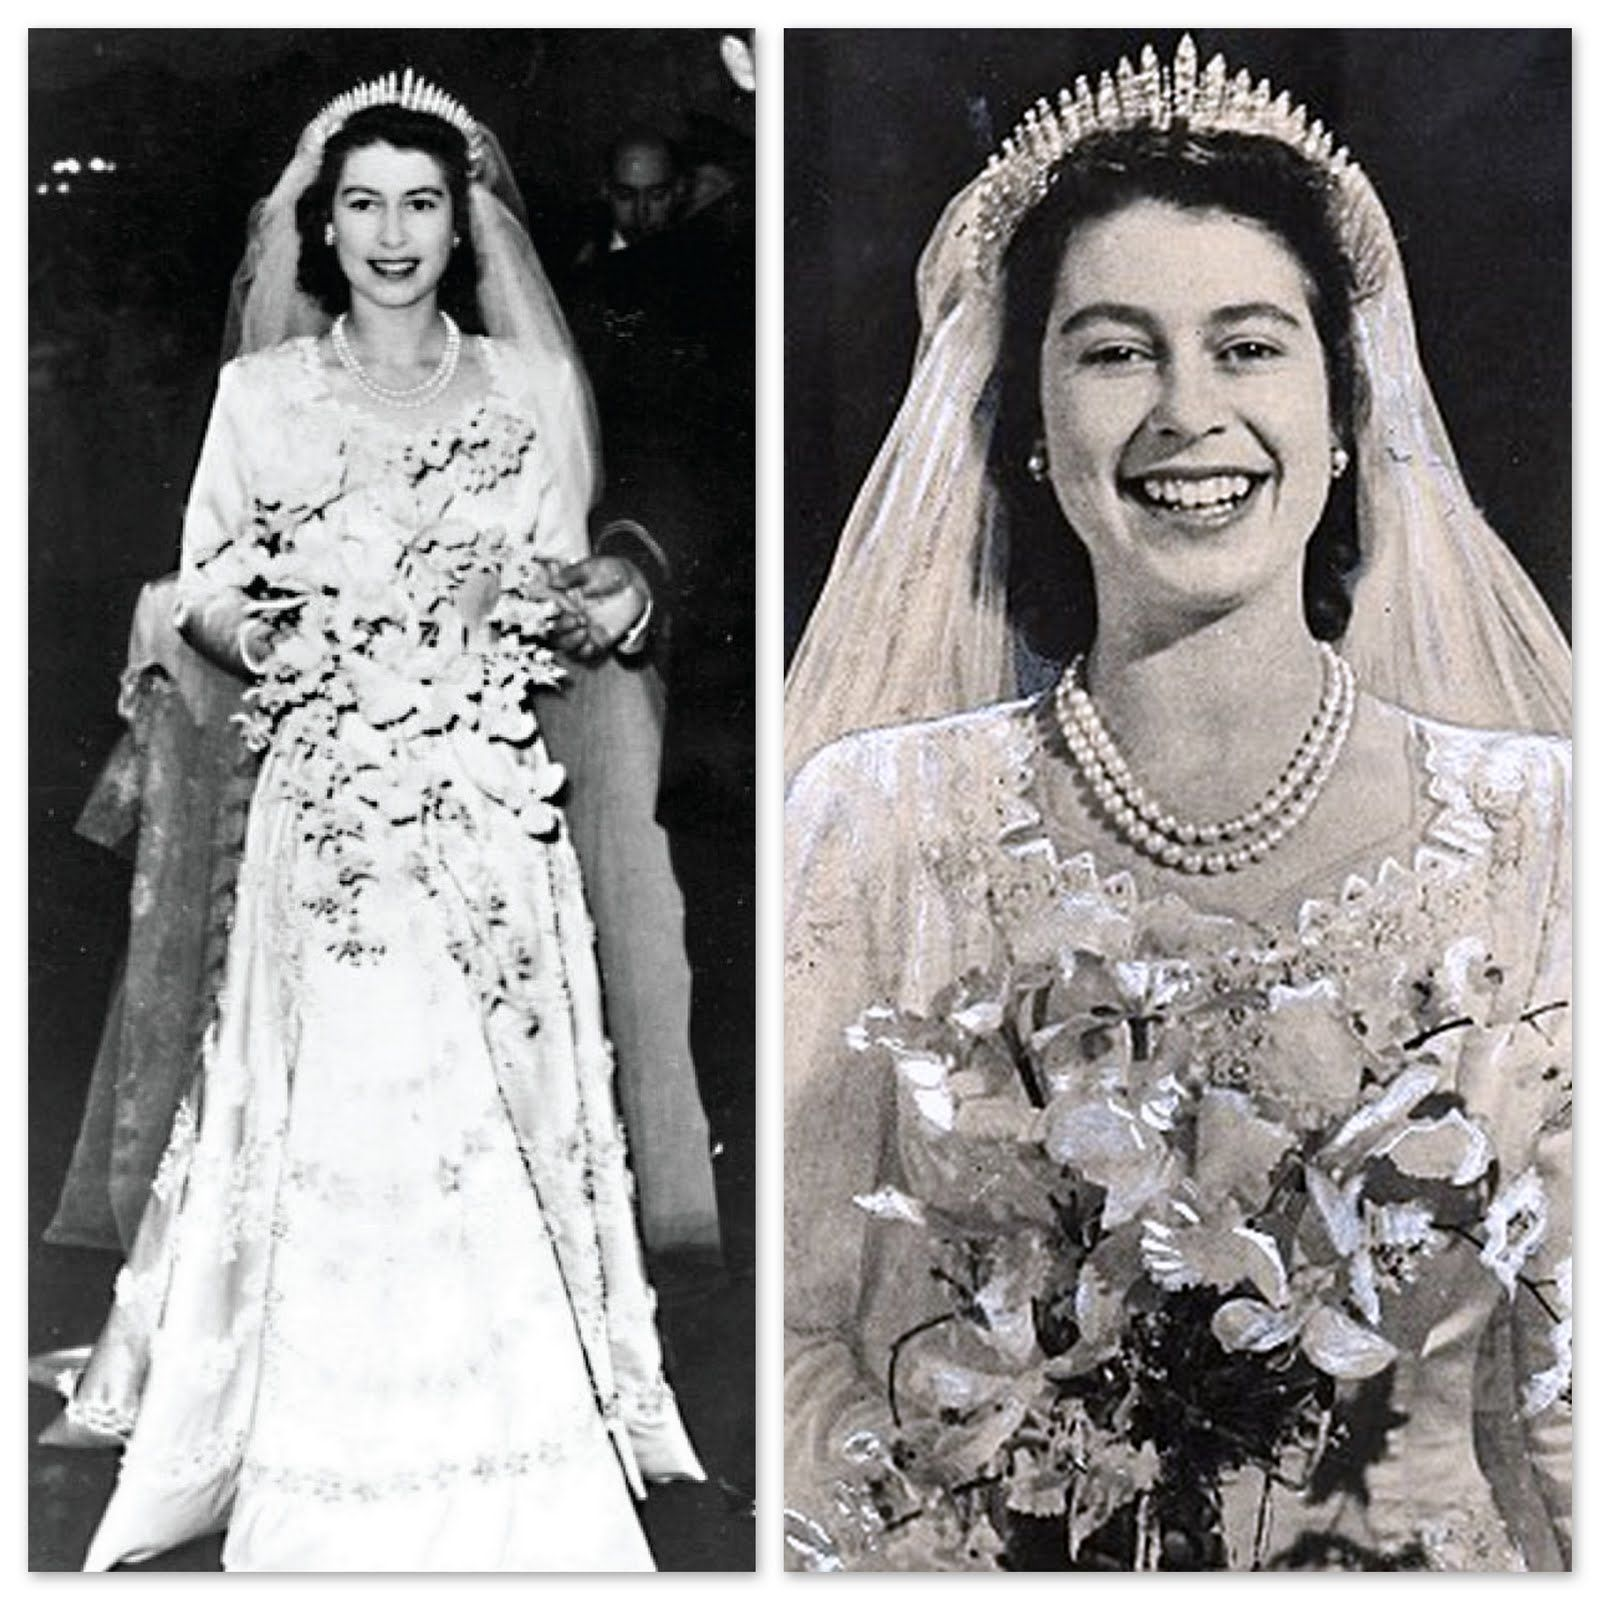 Queen Elizabeth Wedding Gown: Queen Elizabeth Was A Blushing Bride! That Smile Is So